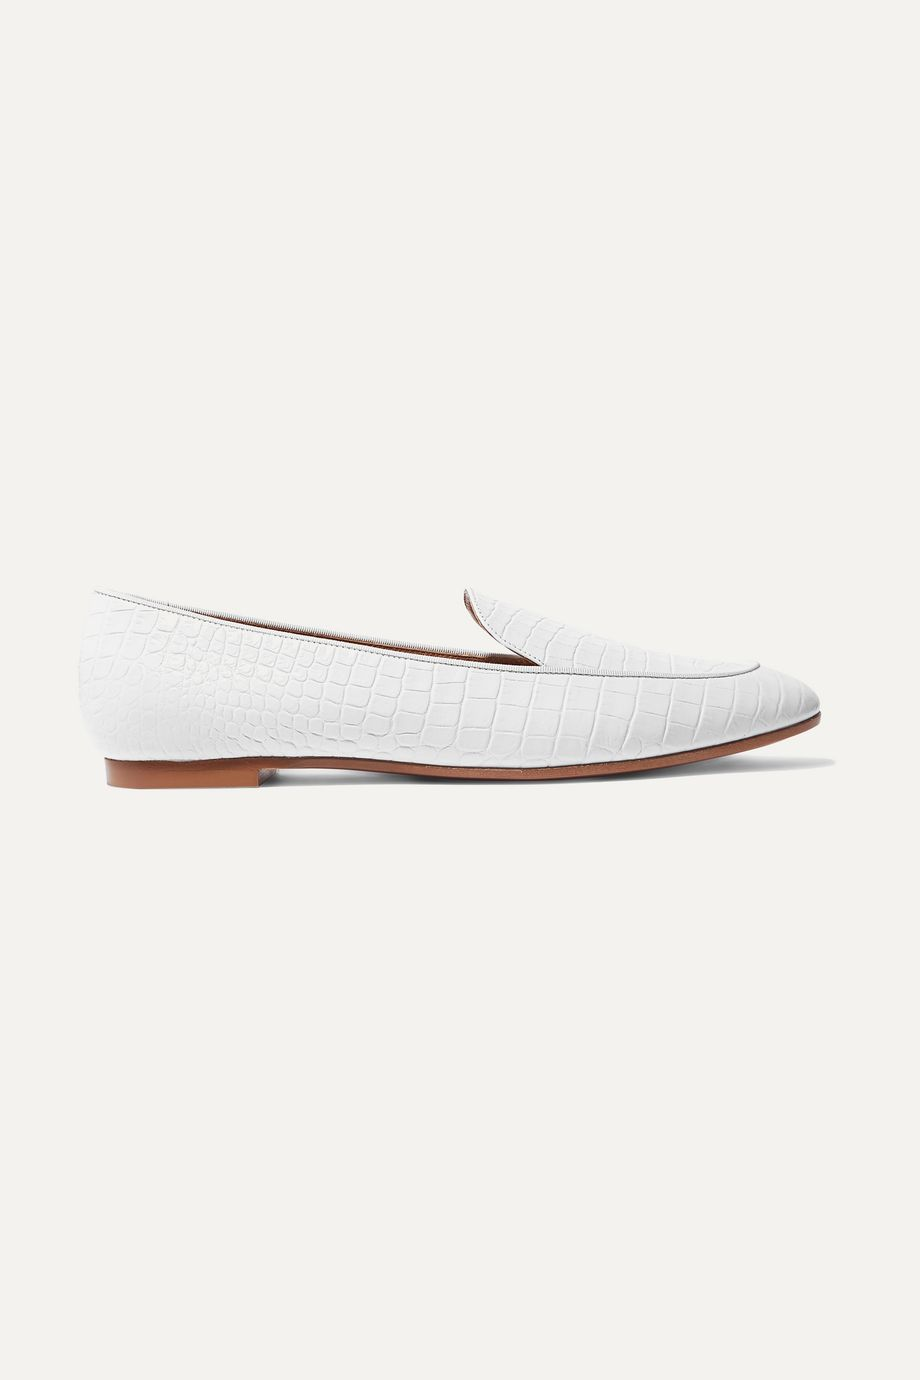 Aquazzura Purist croc-effect leather loafers